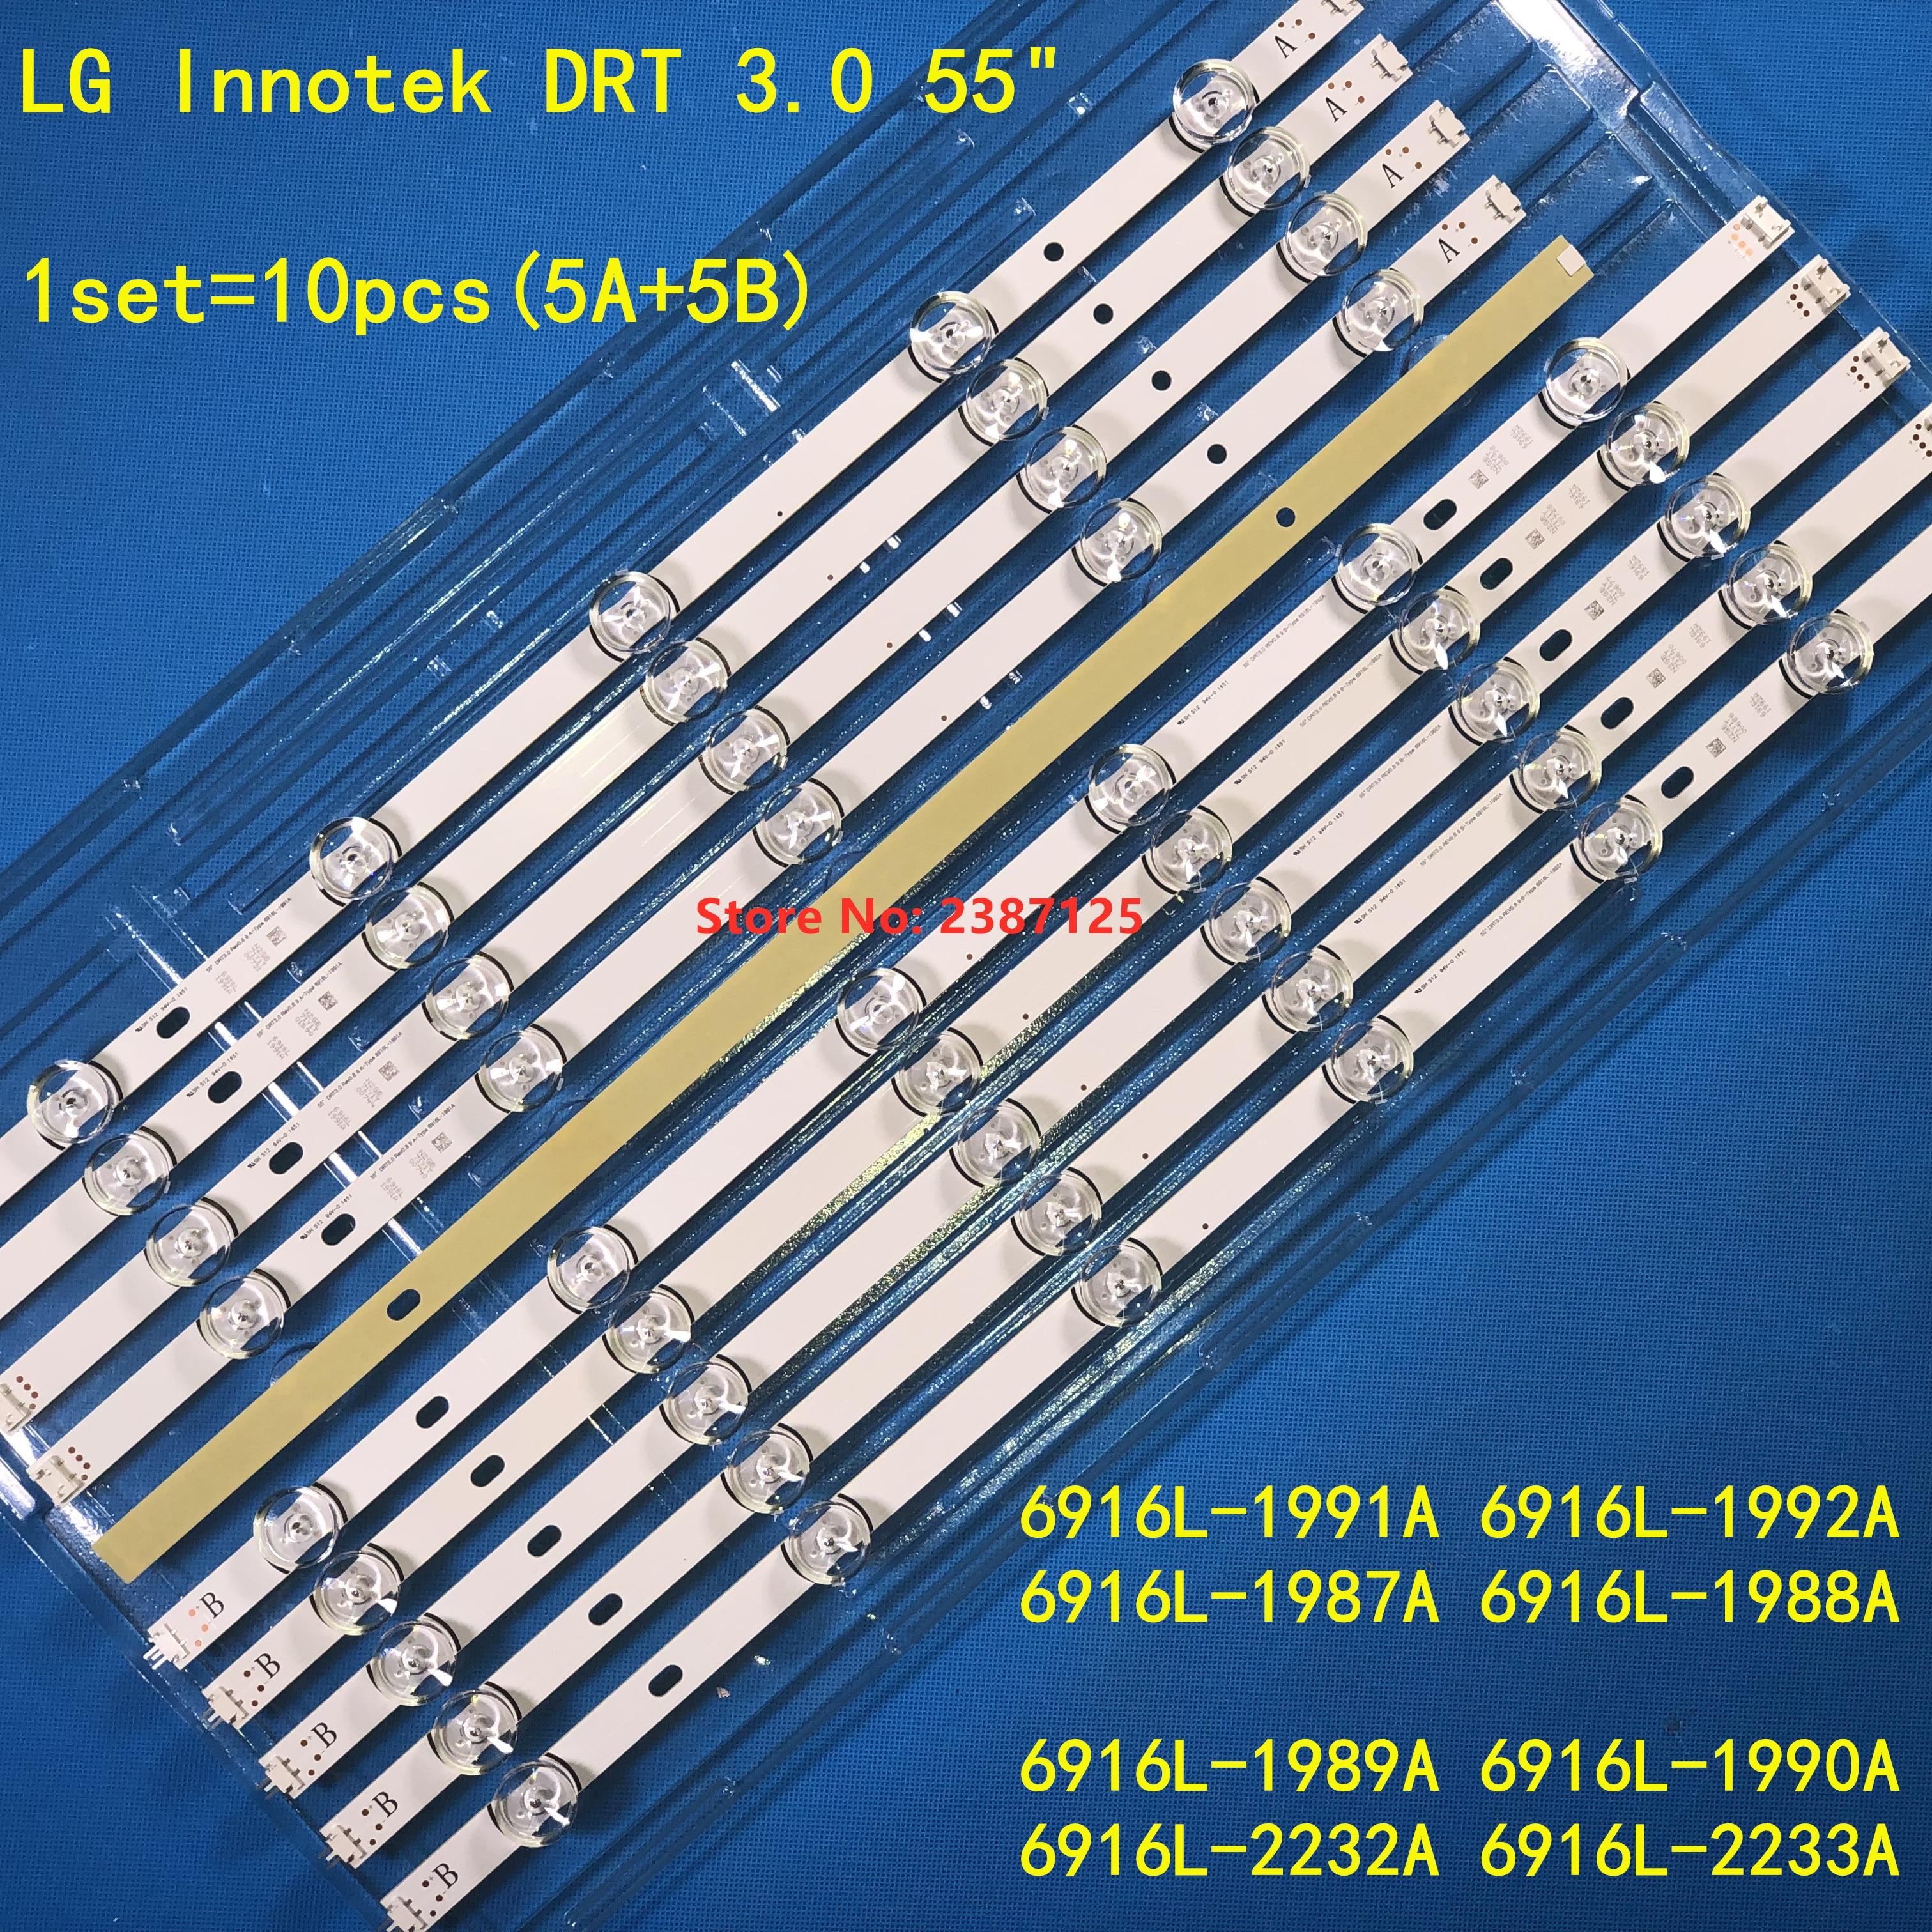 LED قطاع LG Innotek DRT 3.0 55